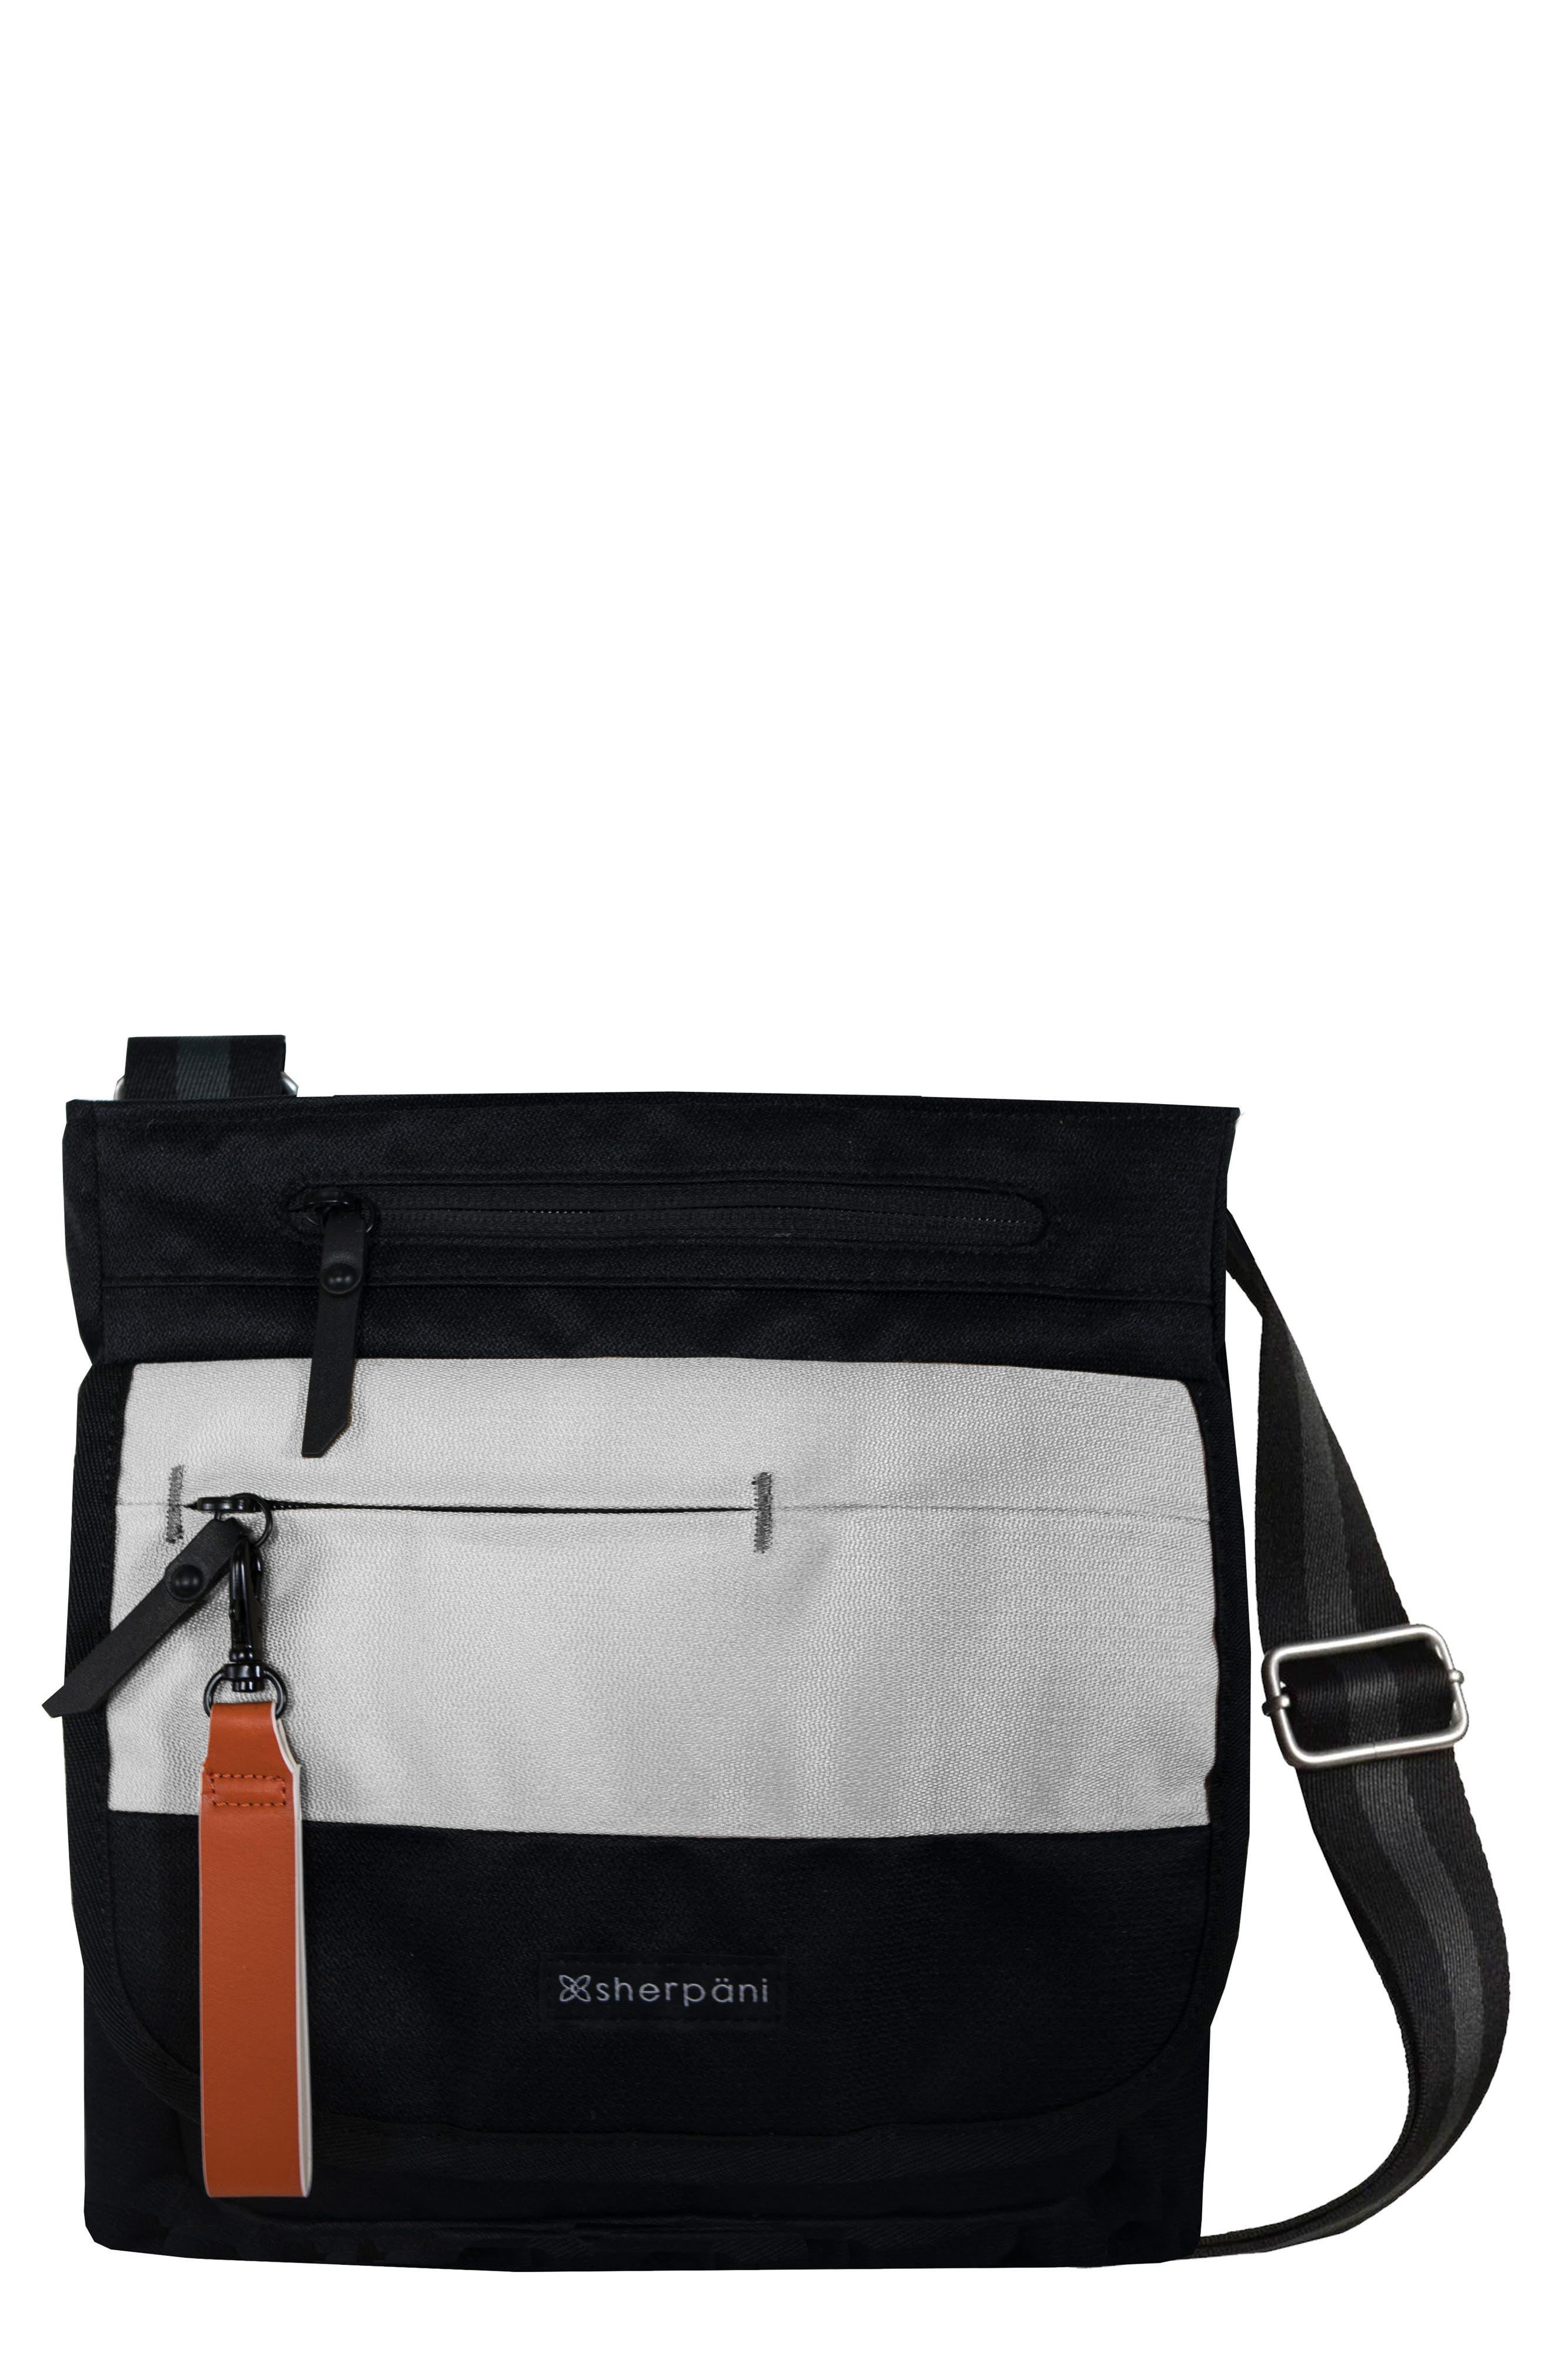 Jag FRFID Crossbody Bag,                             Main thumbnail 1, color,                             Birch